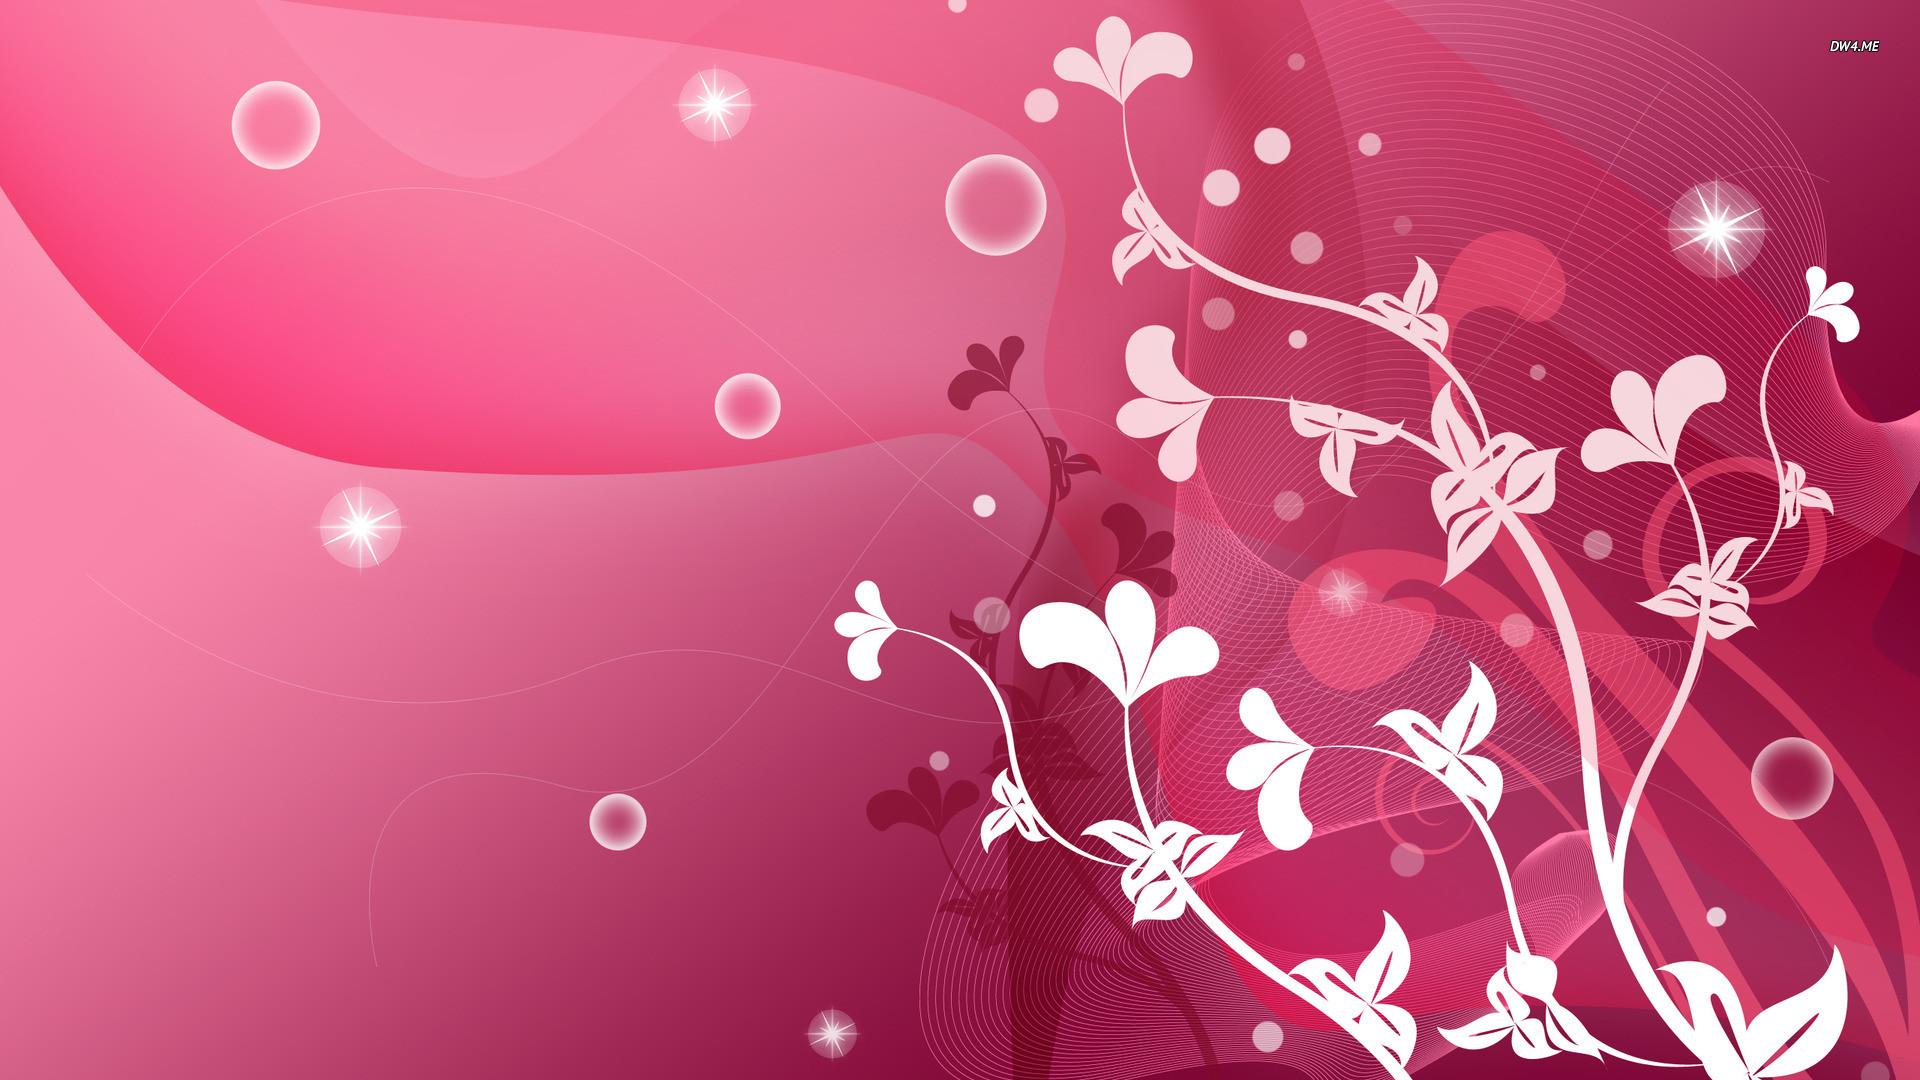 2560x1440 Pink Desktop Large Wallpaper Wallpapers